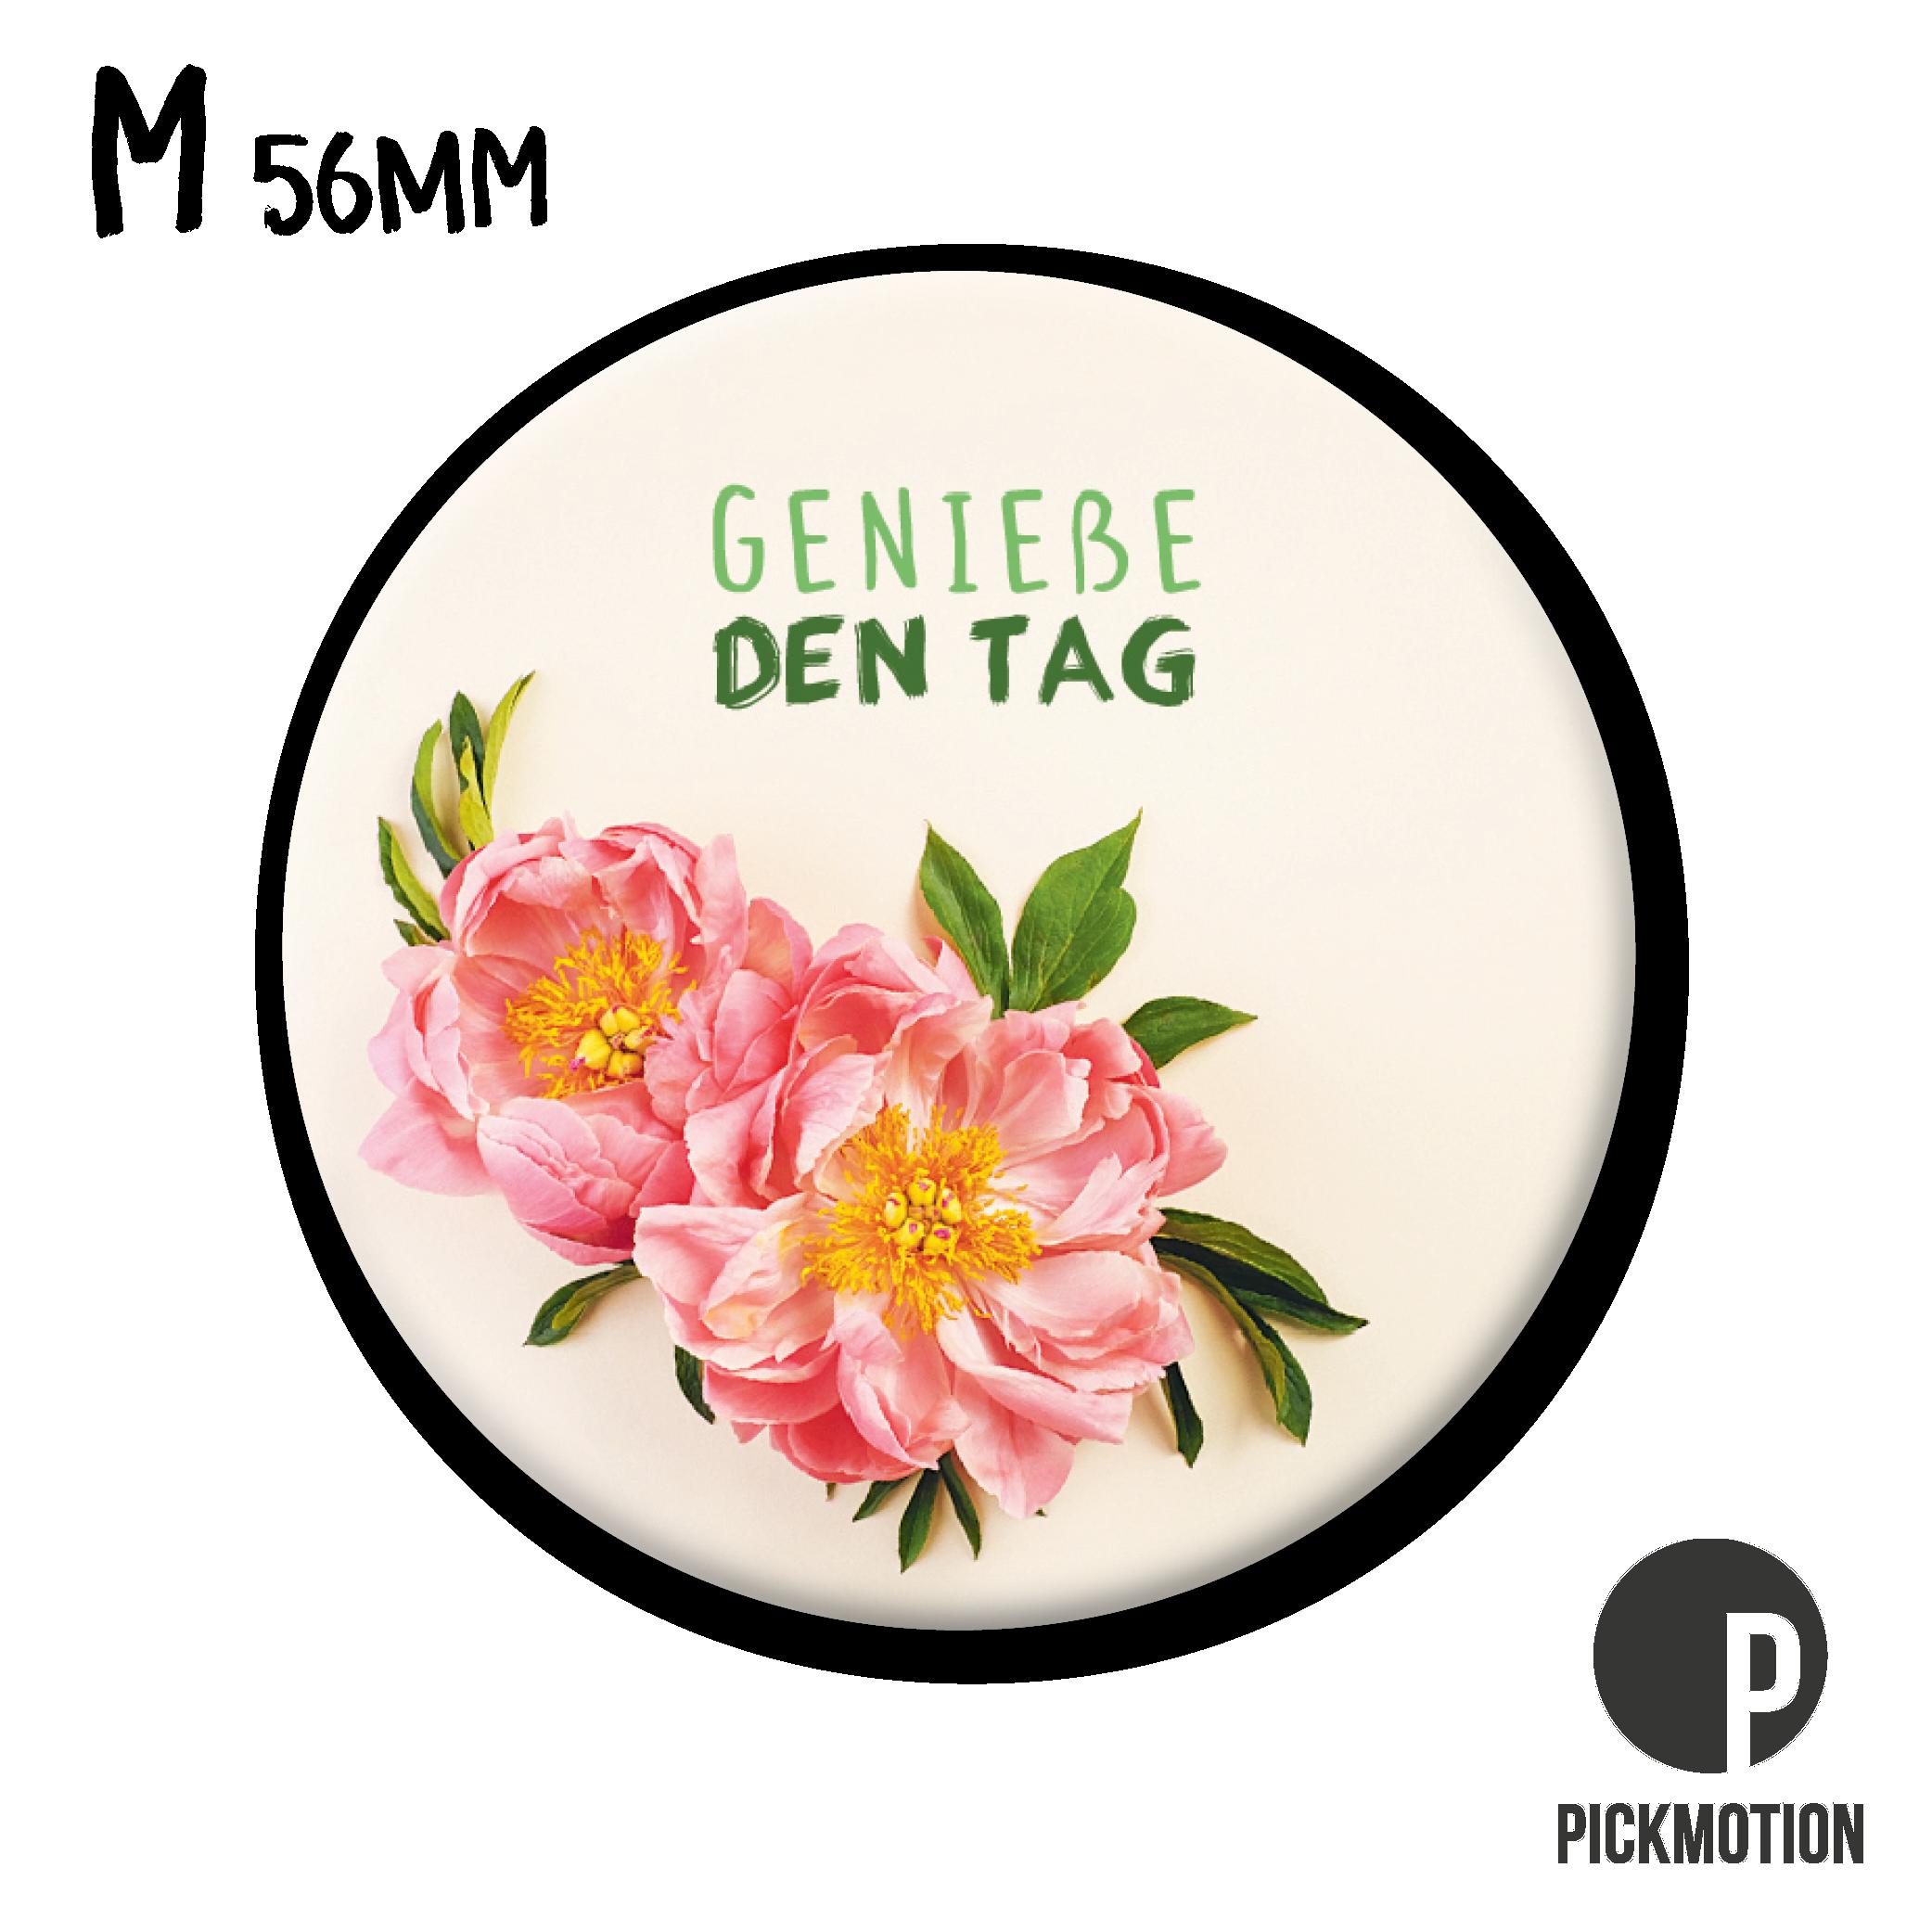 "Kühlschrank-Magnet - Medium - ""Genieße den Tag"" - MM 0867-DE - Pickmotion"